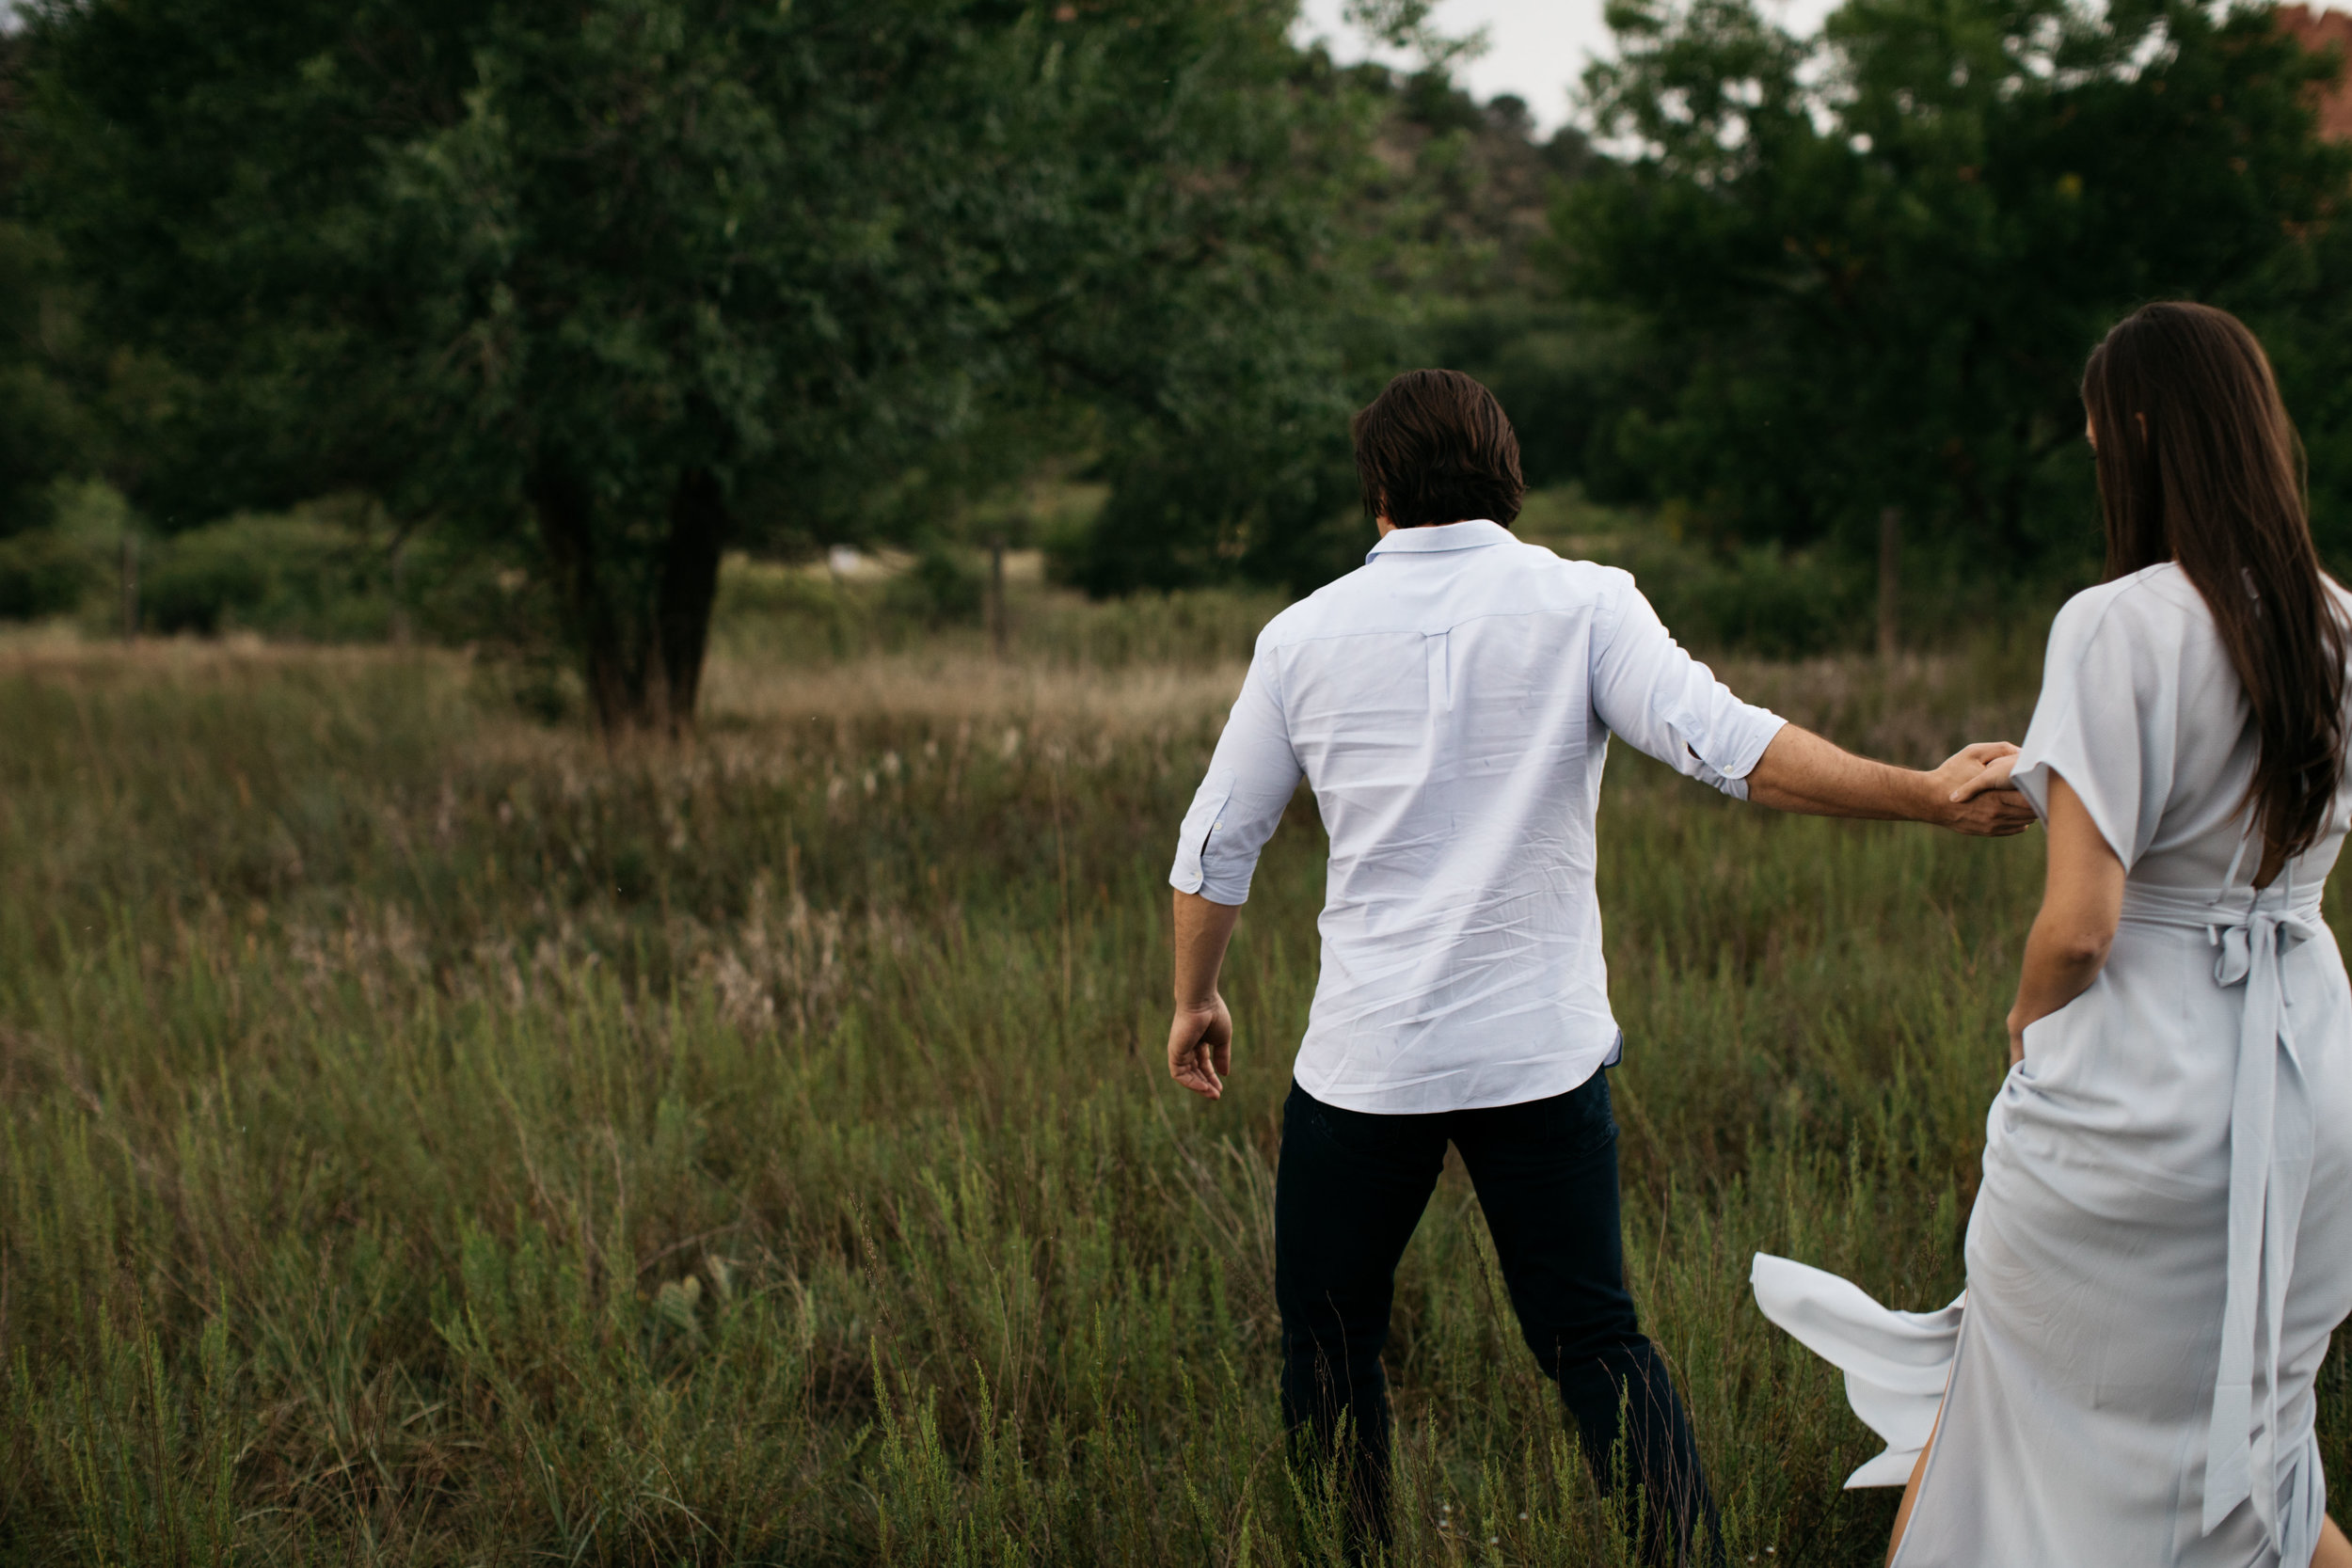 broadmoor-engagement-photography-104.jpg